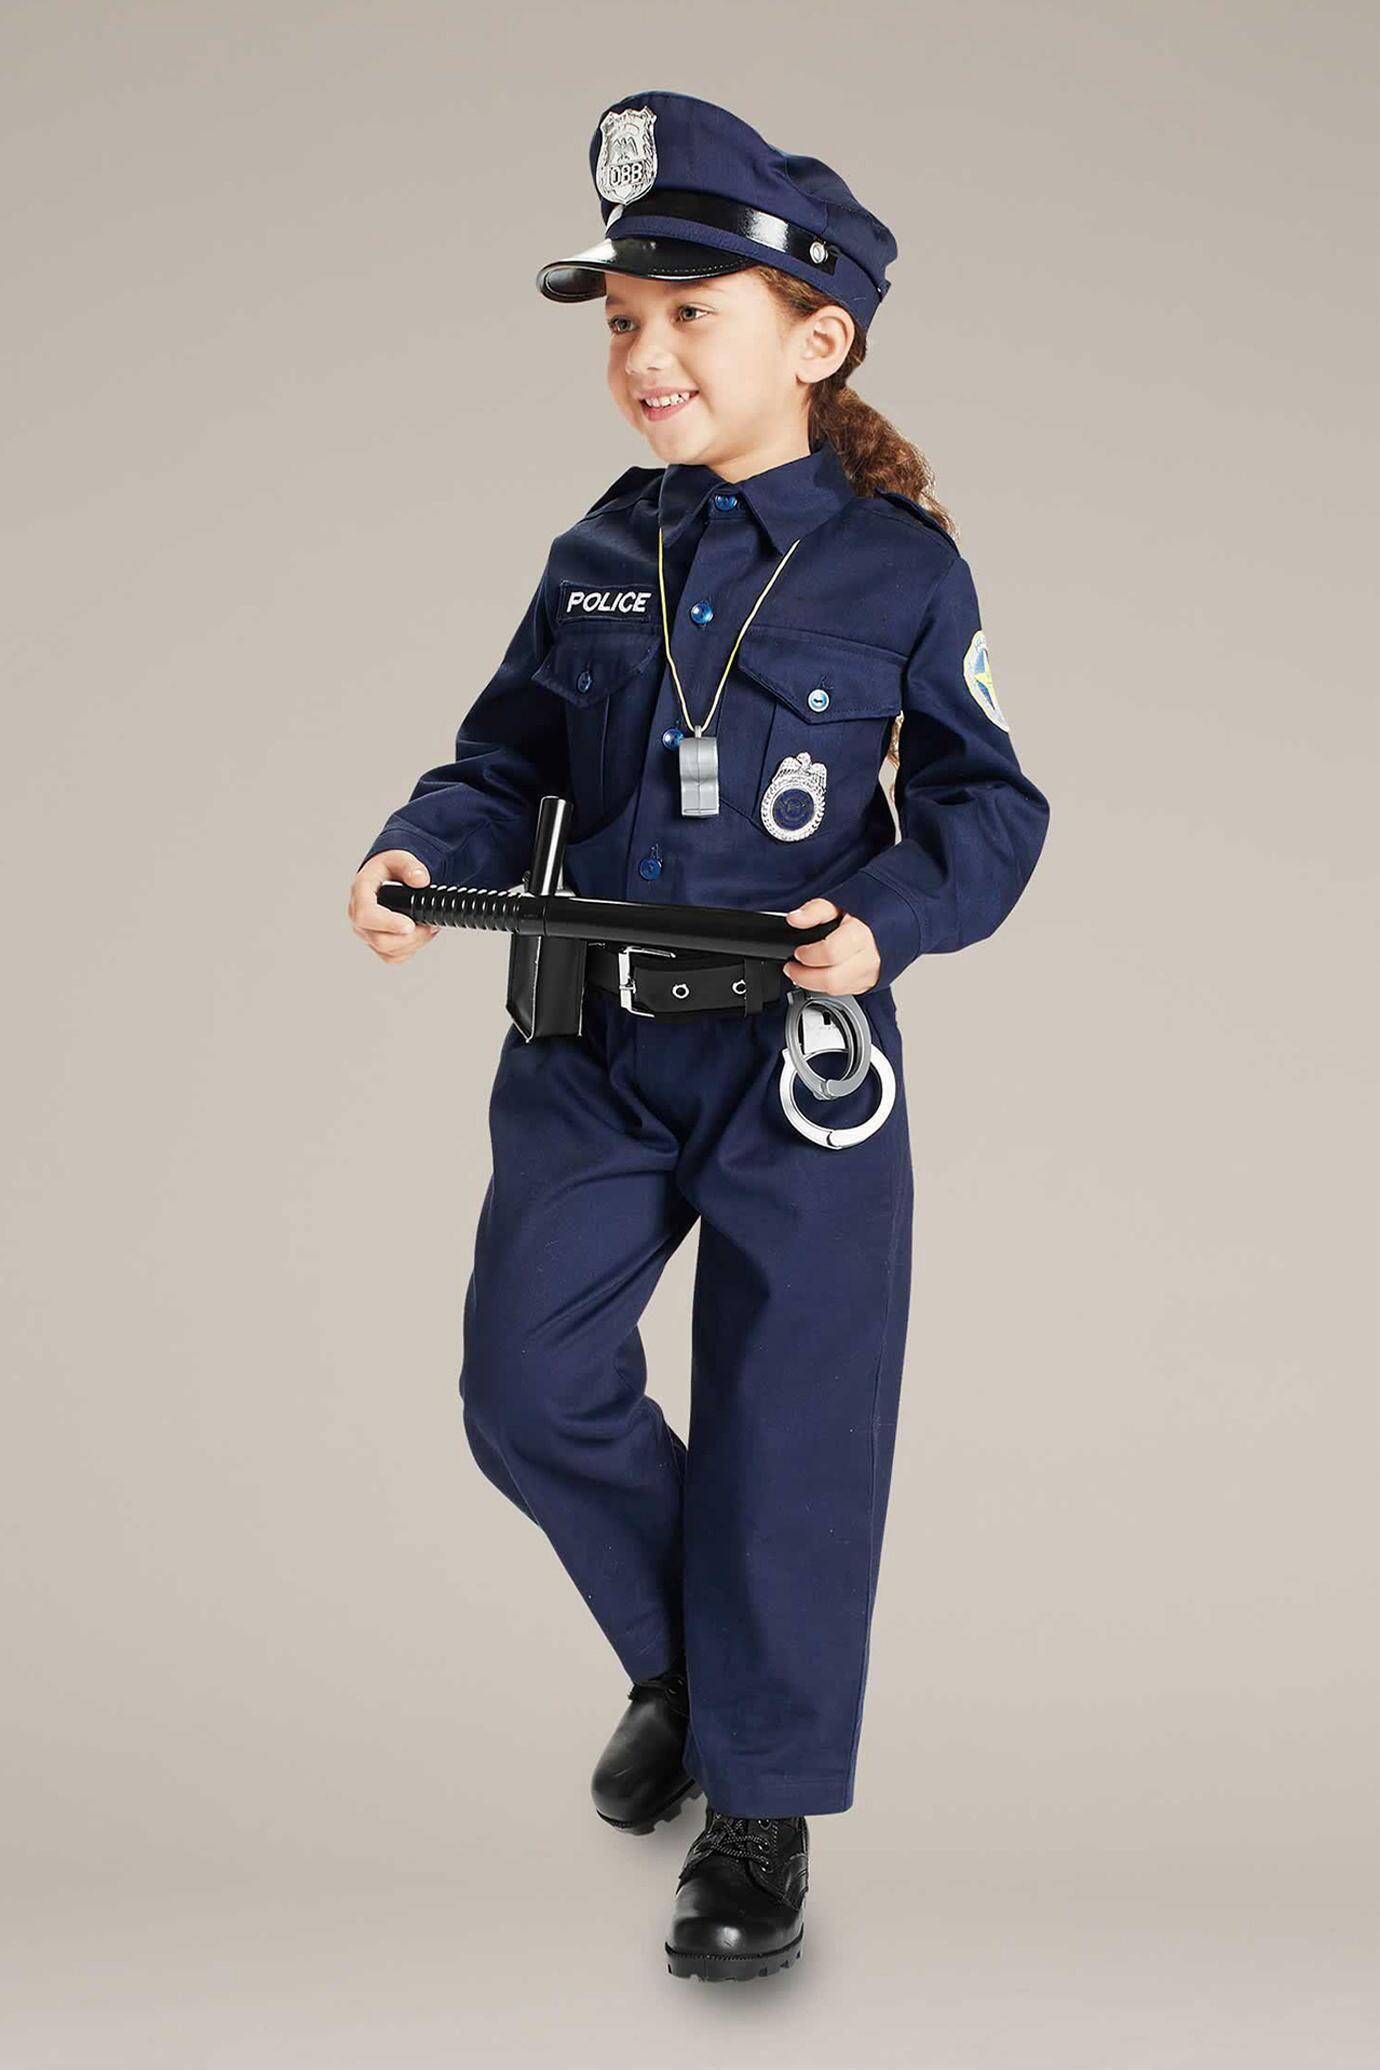 Police Officer Costume For Kids In 2021 Police Costume Kids Cop Costume For Kids Police Officer Costume